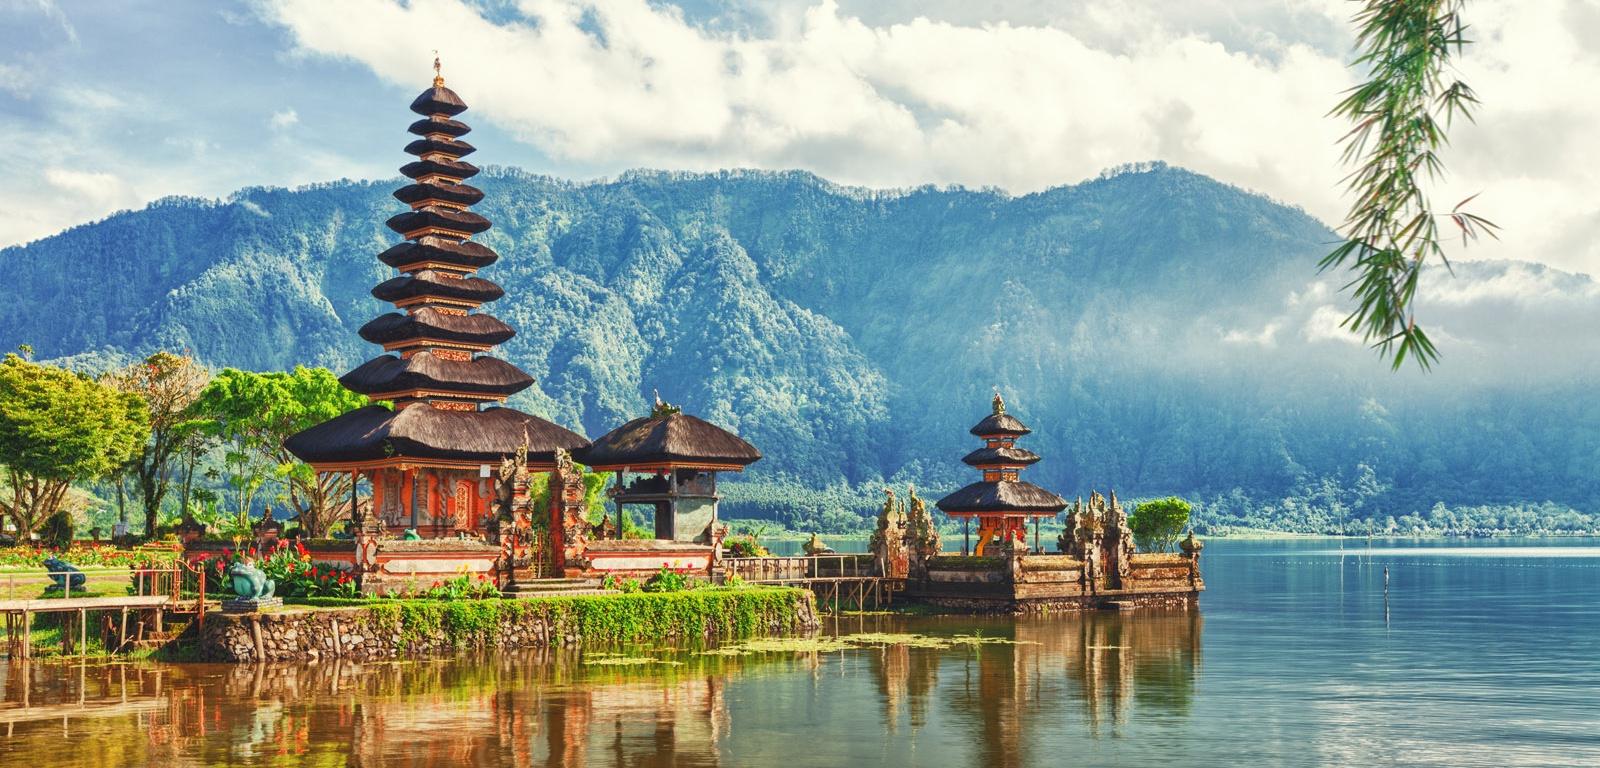 Bali Temple & Montagne